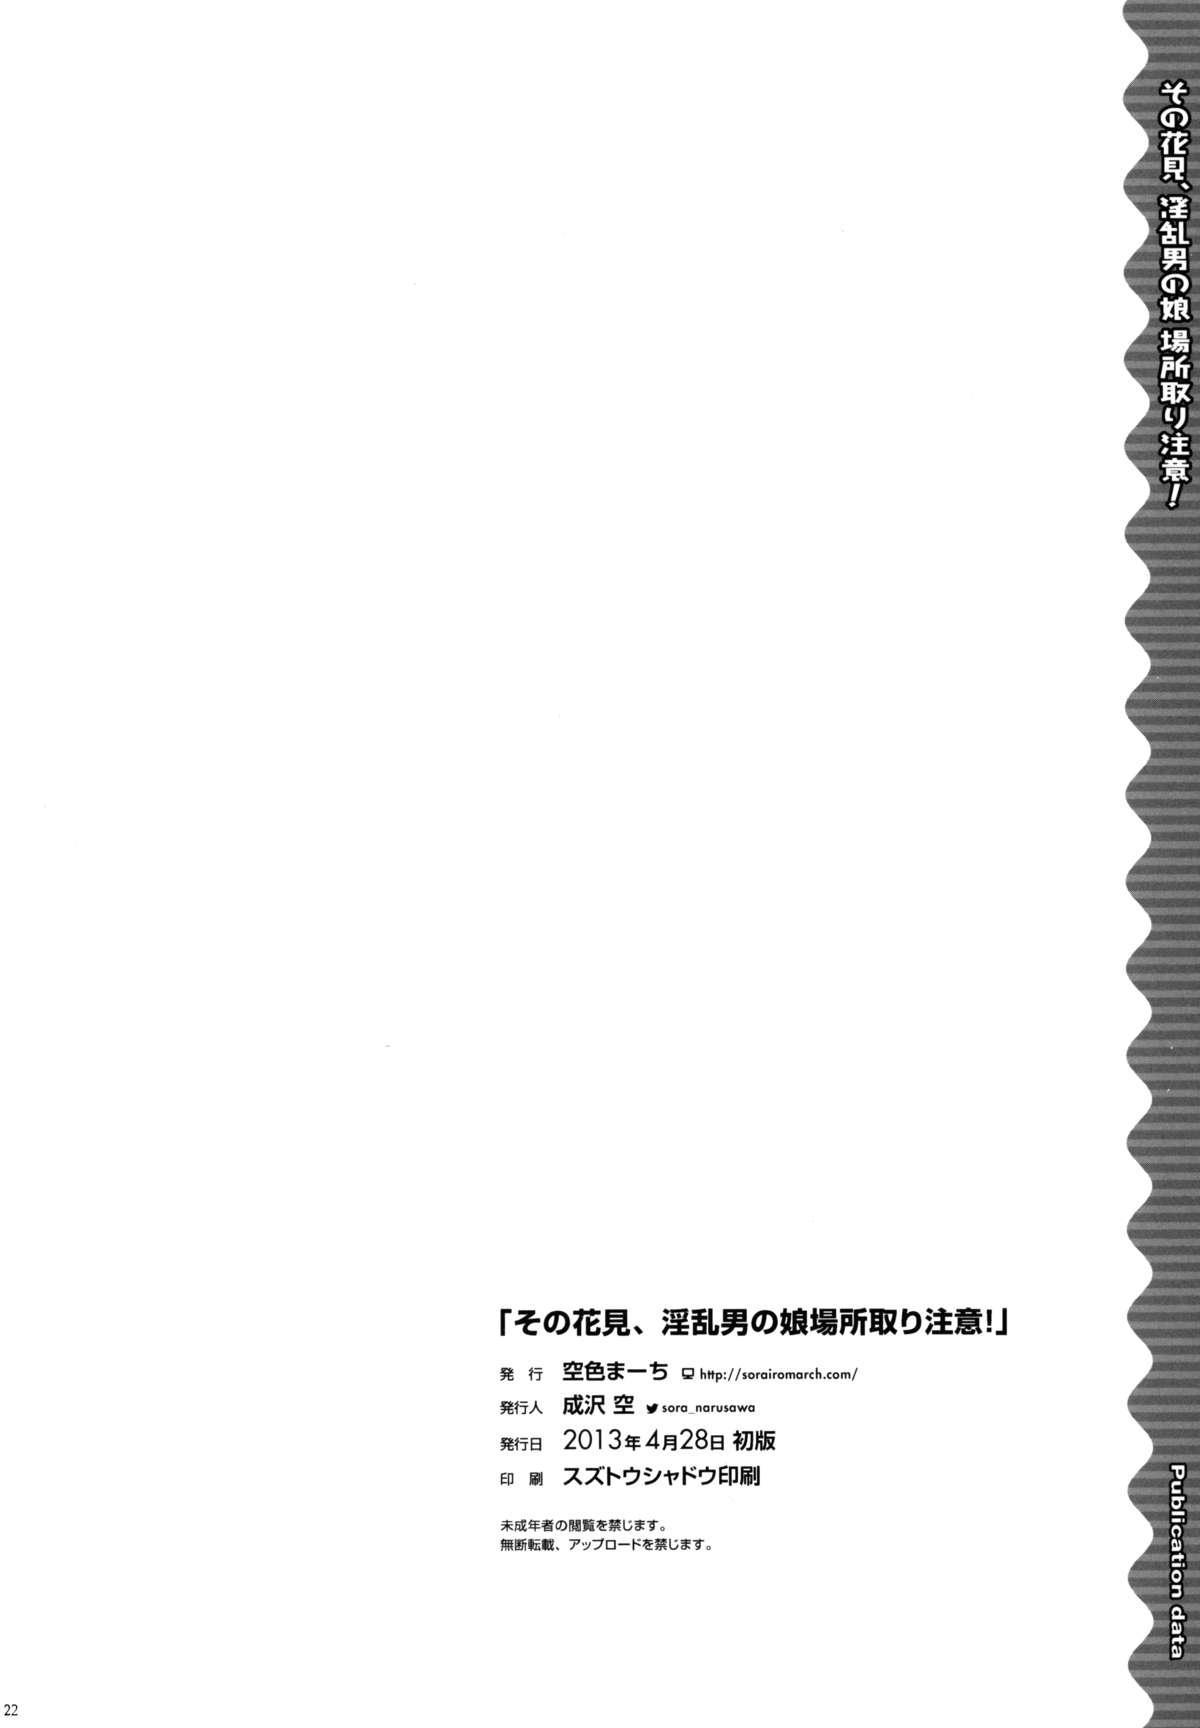 Sono Hanami, Inran Otokonoko Basho Tori Chuui | Beware of slutty traps while claiming places for cherry blossom viewing! 20